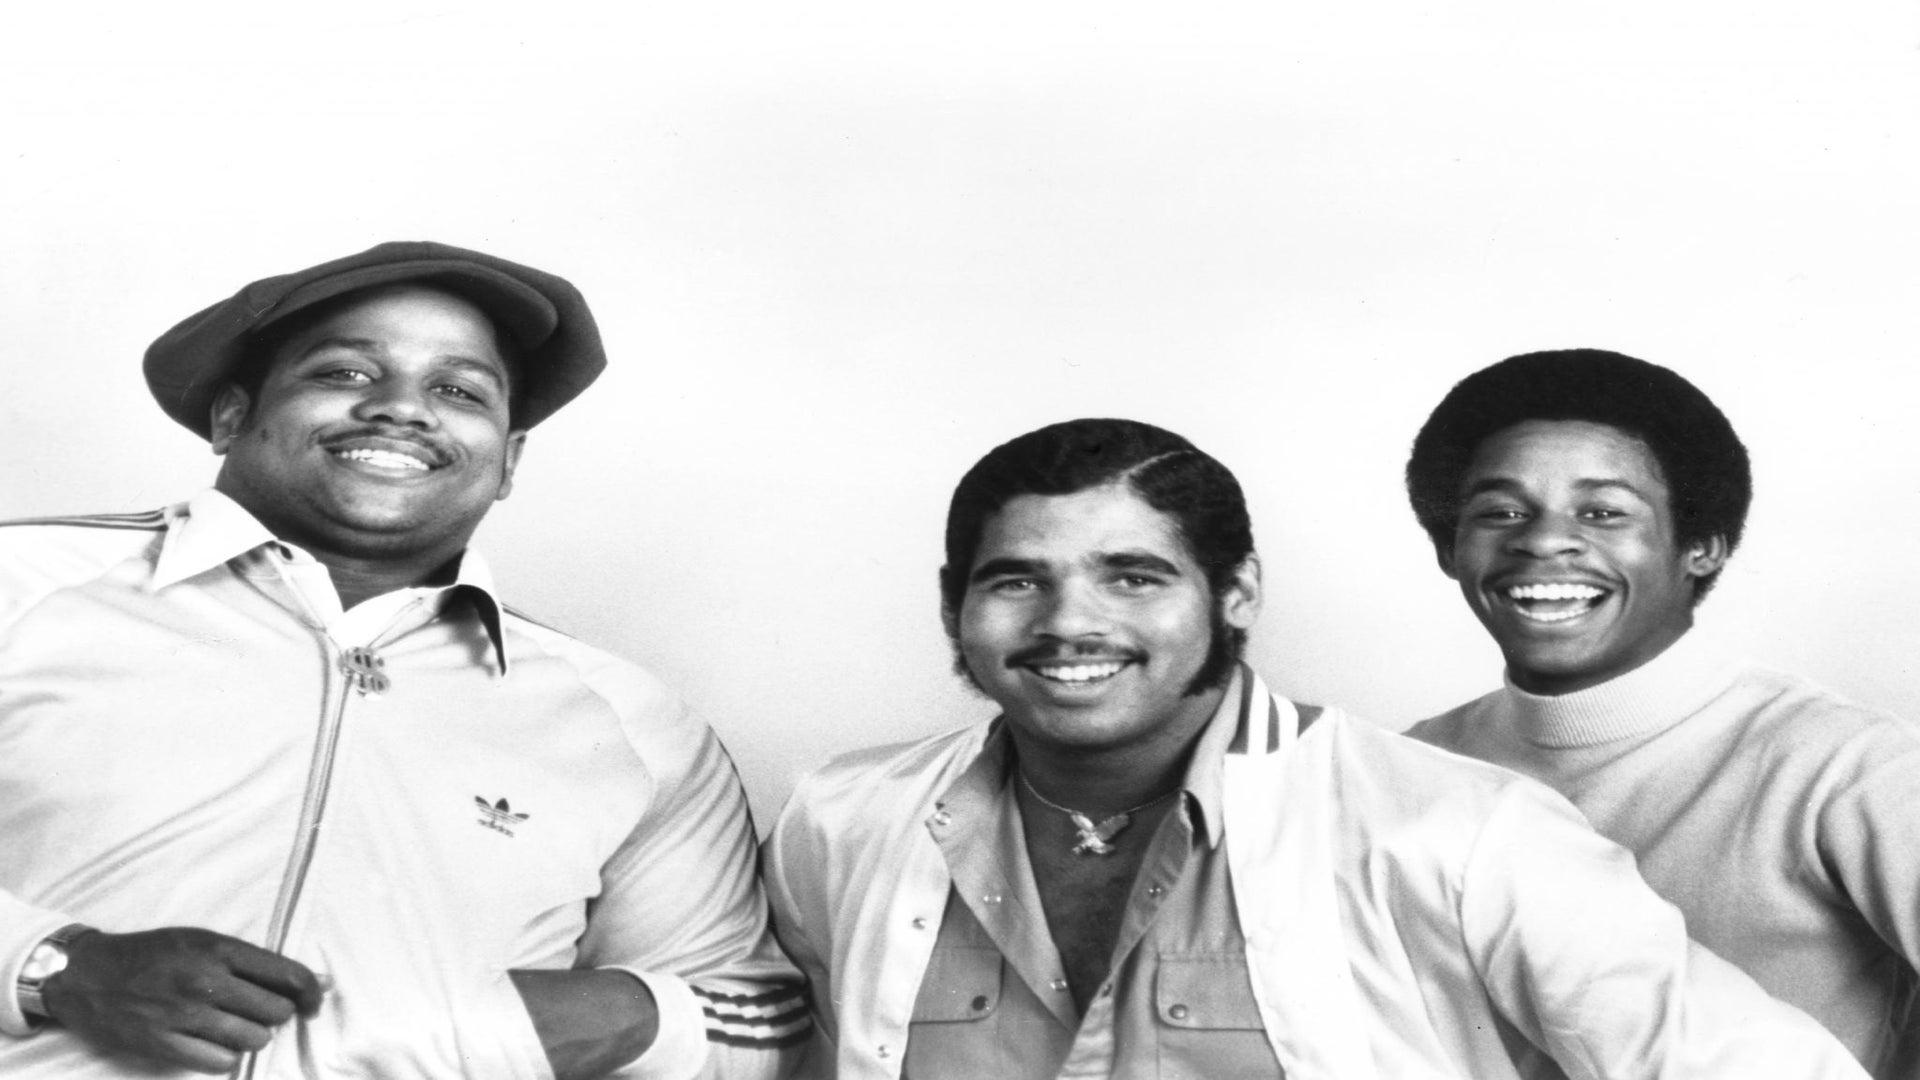 Coffee Talk: Sugarhill Gang, Run-DMC Songs Head to Grammy Hall of Fame